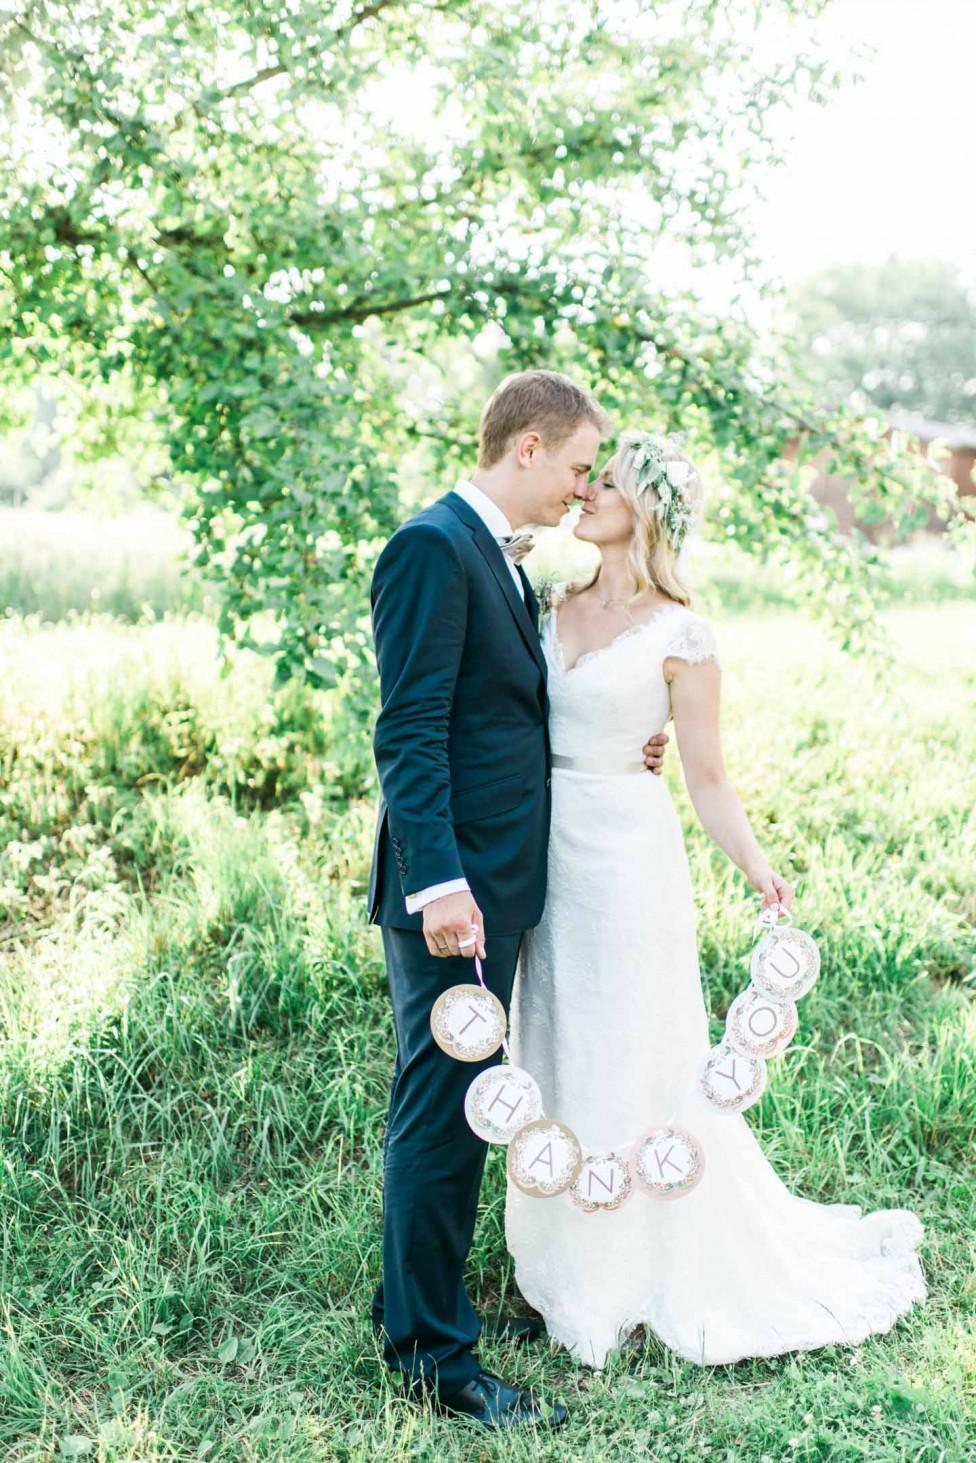 Hofgut Maisenburg: Bohemian Hochzeitstraum